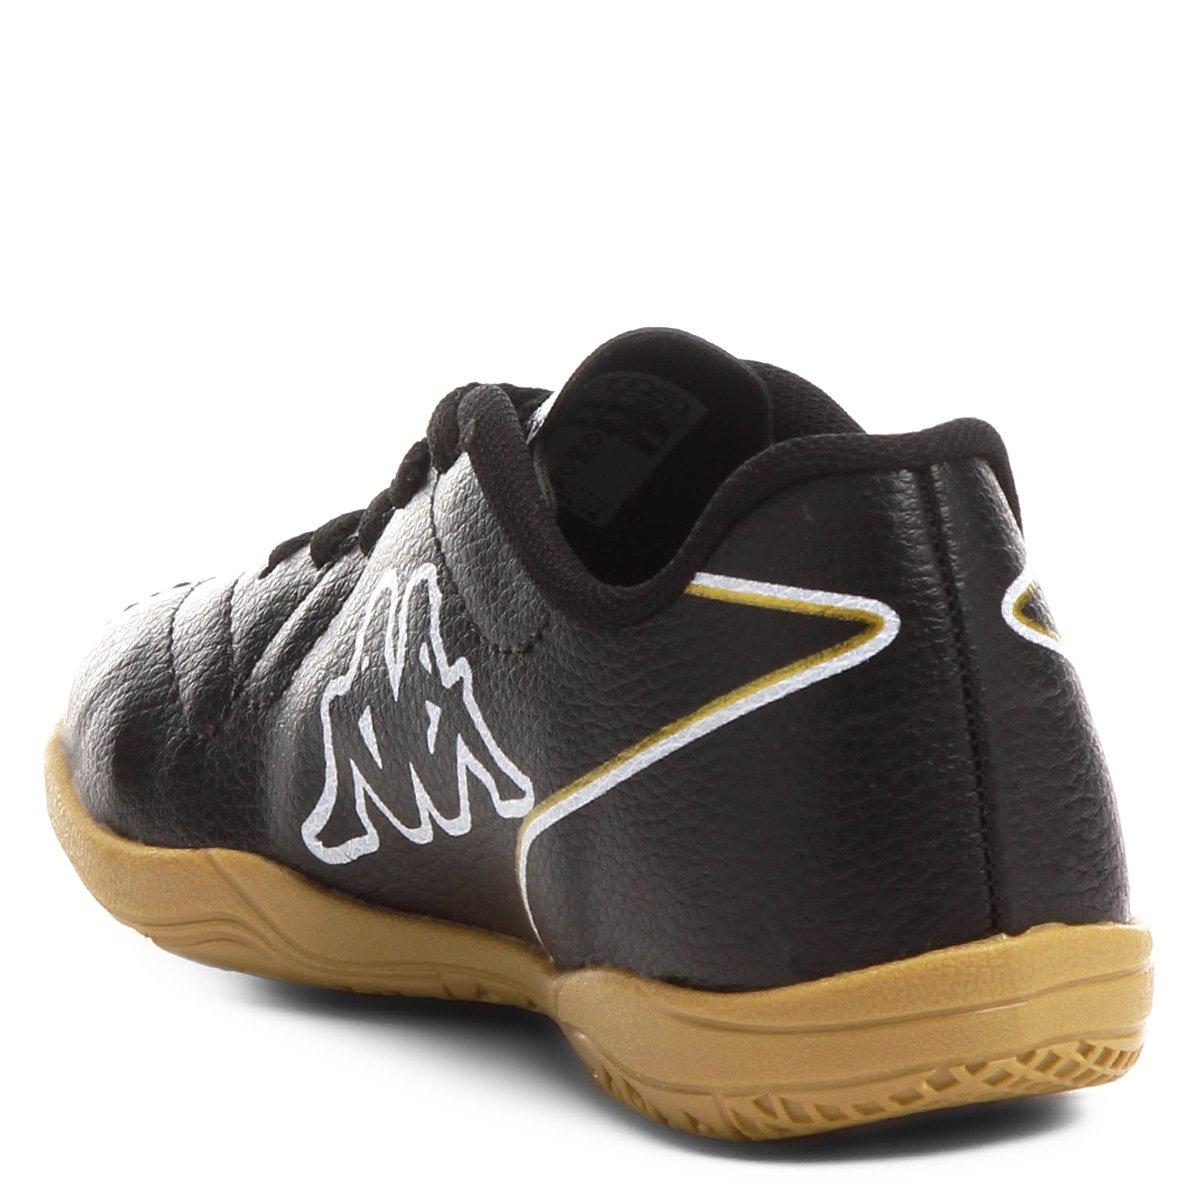 1a91f444ee Chuteira Futsal Infantil Kappa Panaro - Compre Agora